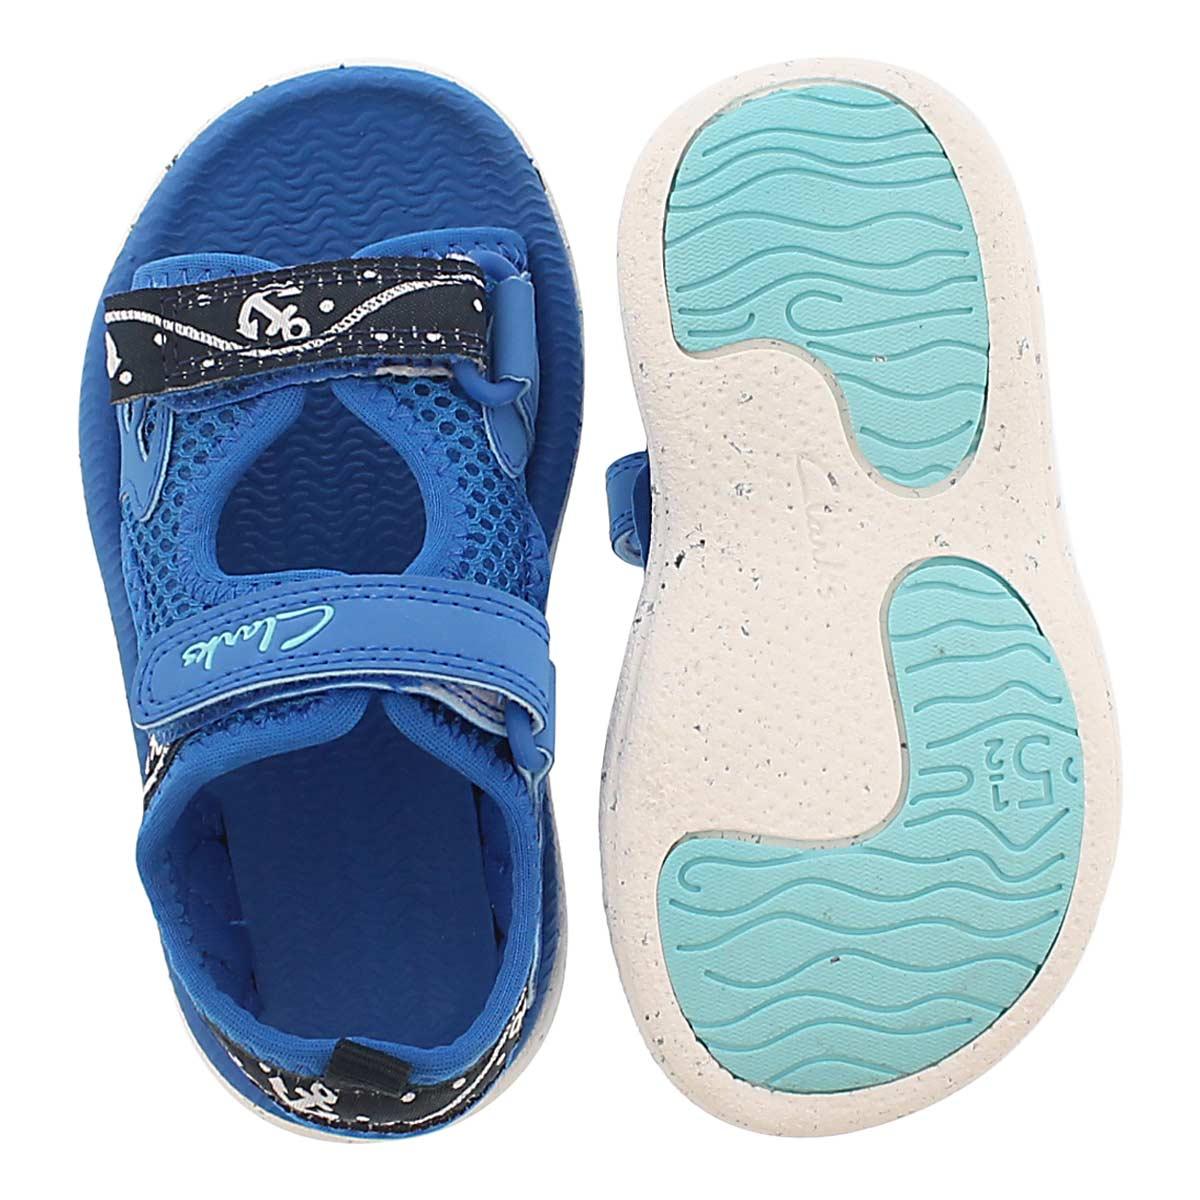 Inf Piranha Boy navy sport sandal